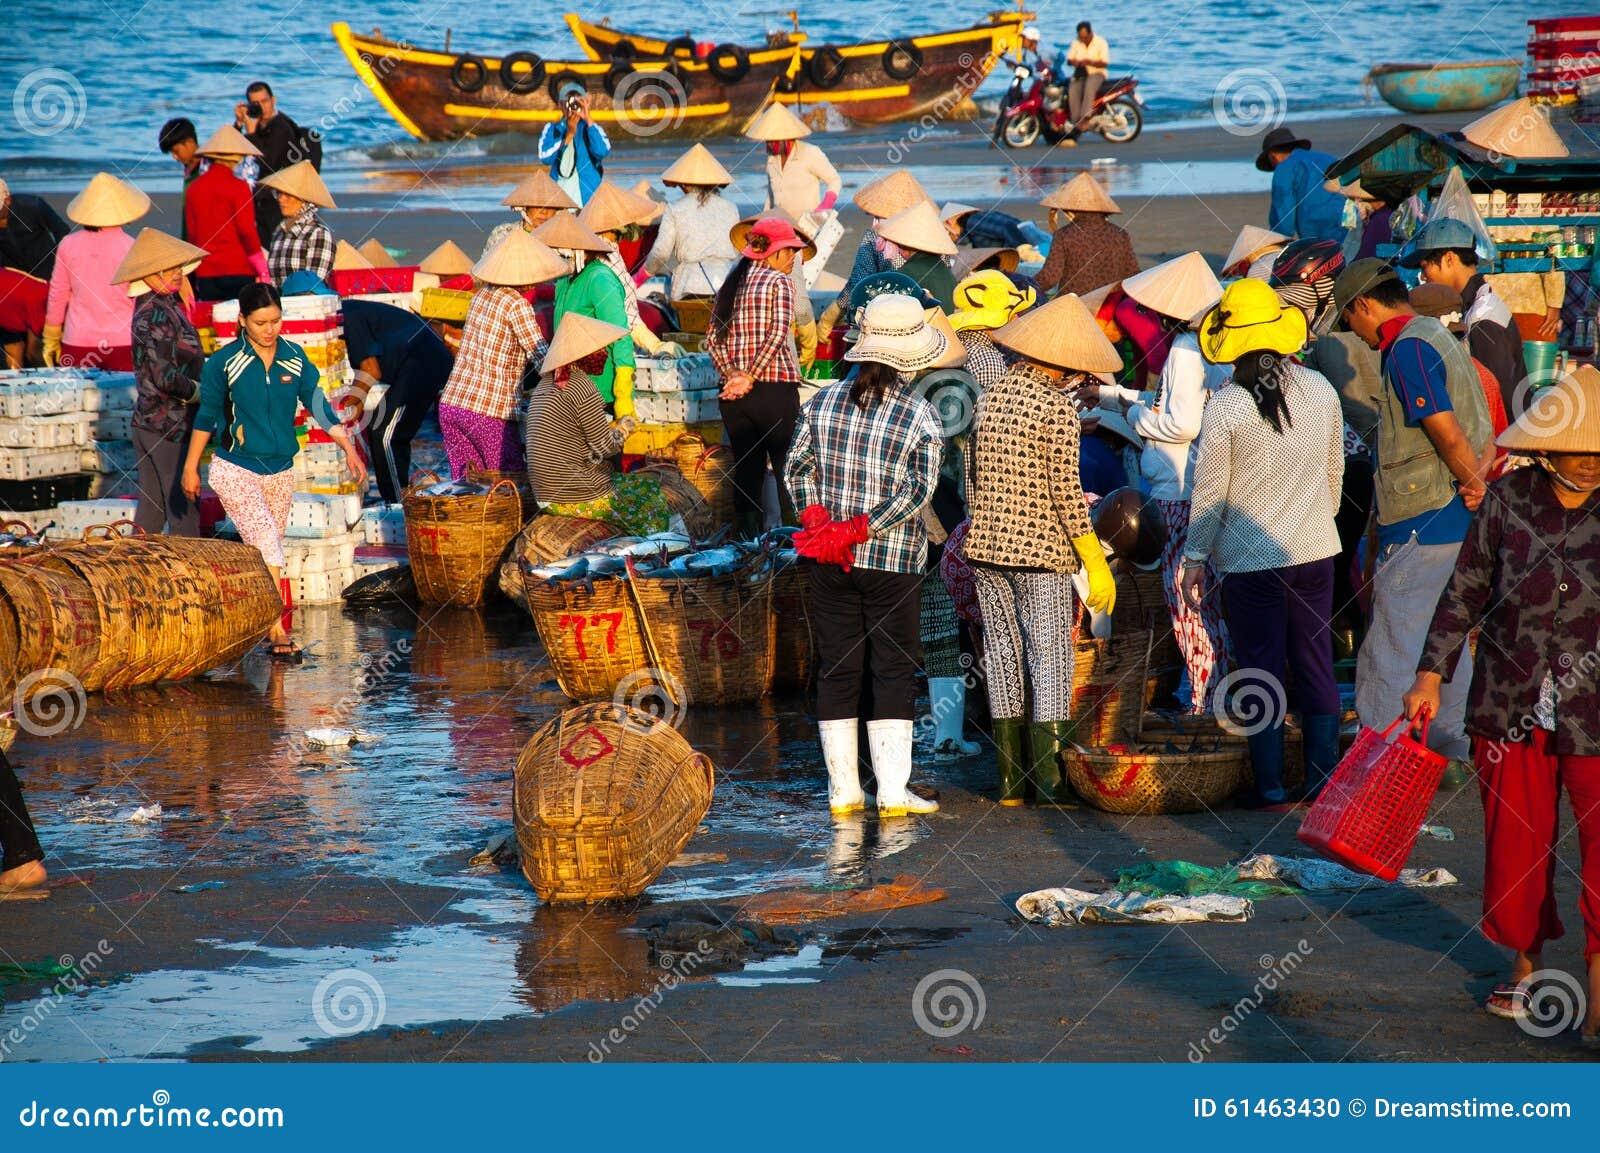 fish market in long hai vietnam editorial image image of travel